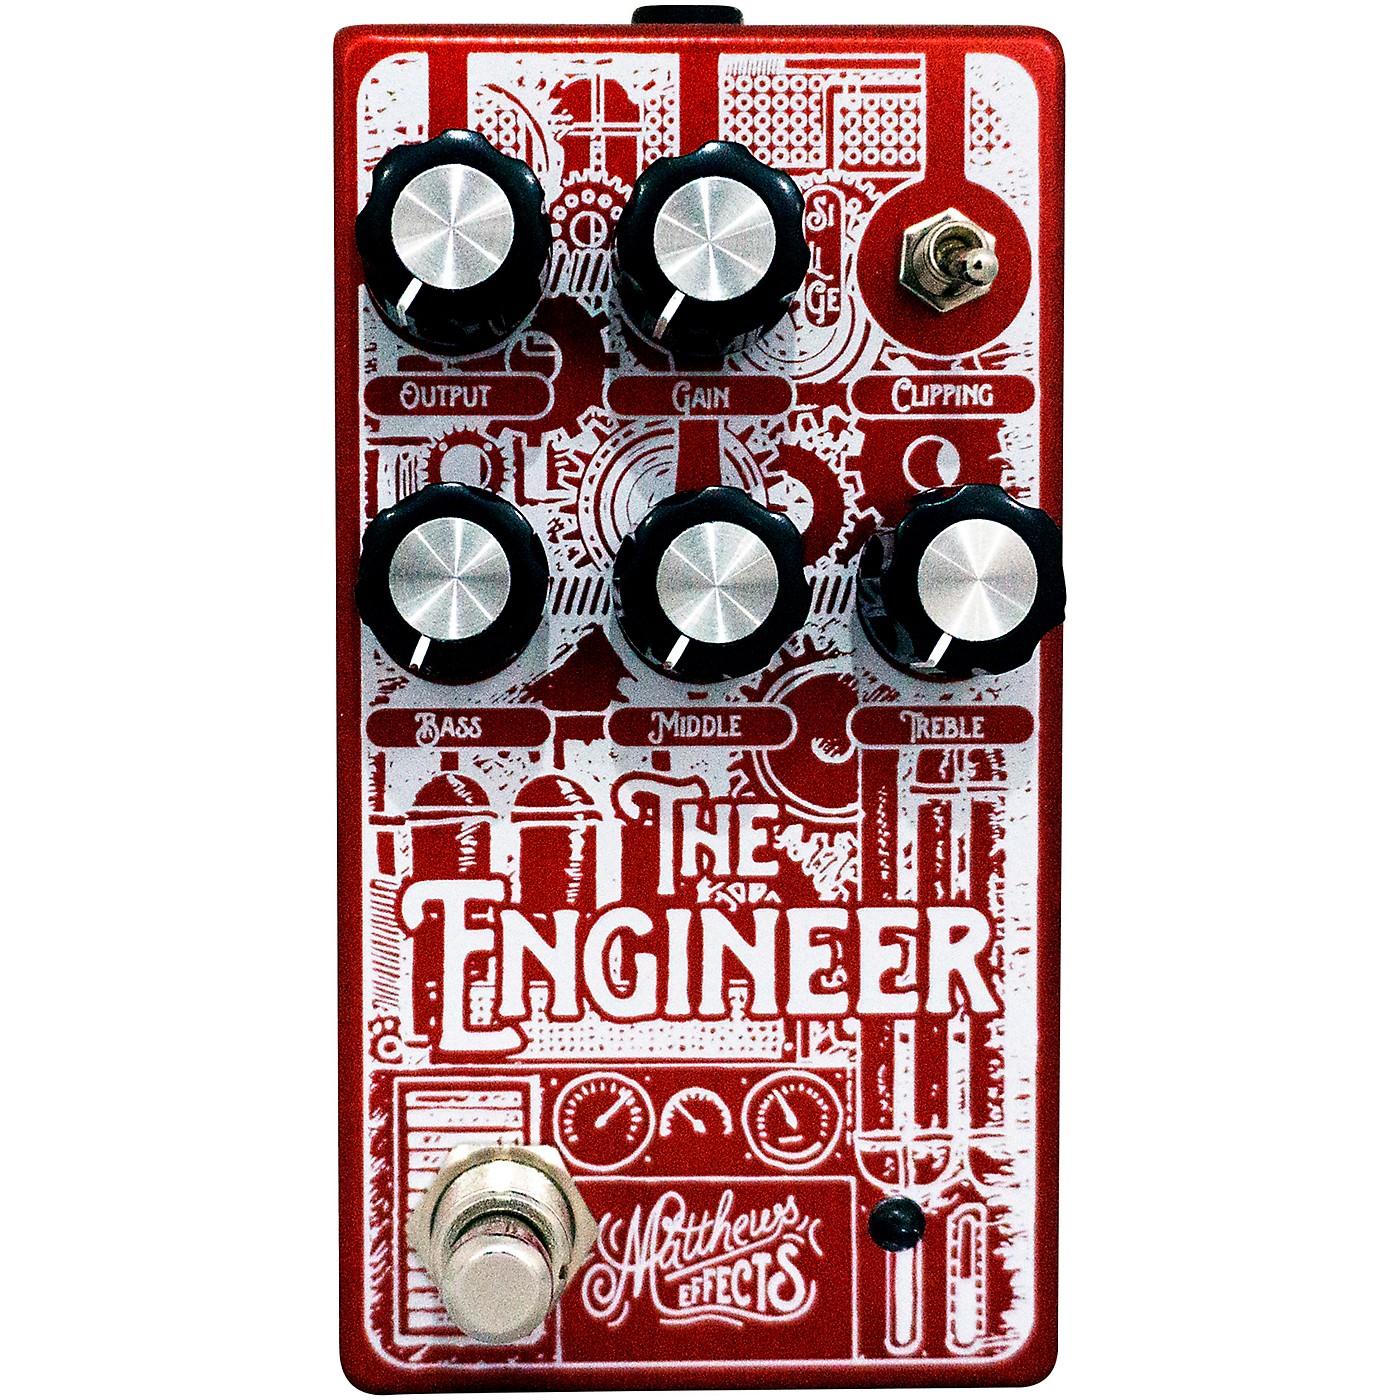 Matthews Effects Engineer Foundational Bass Overdrive Effects Pedal thumbnail